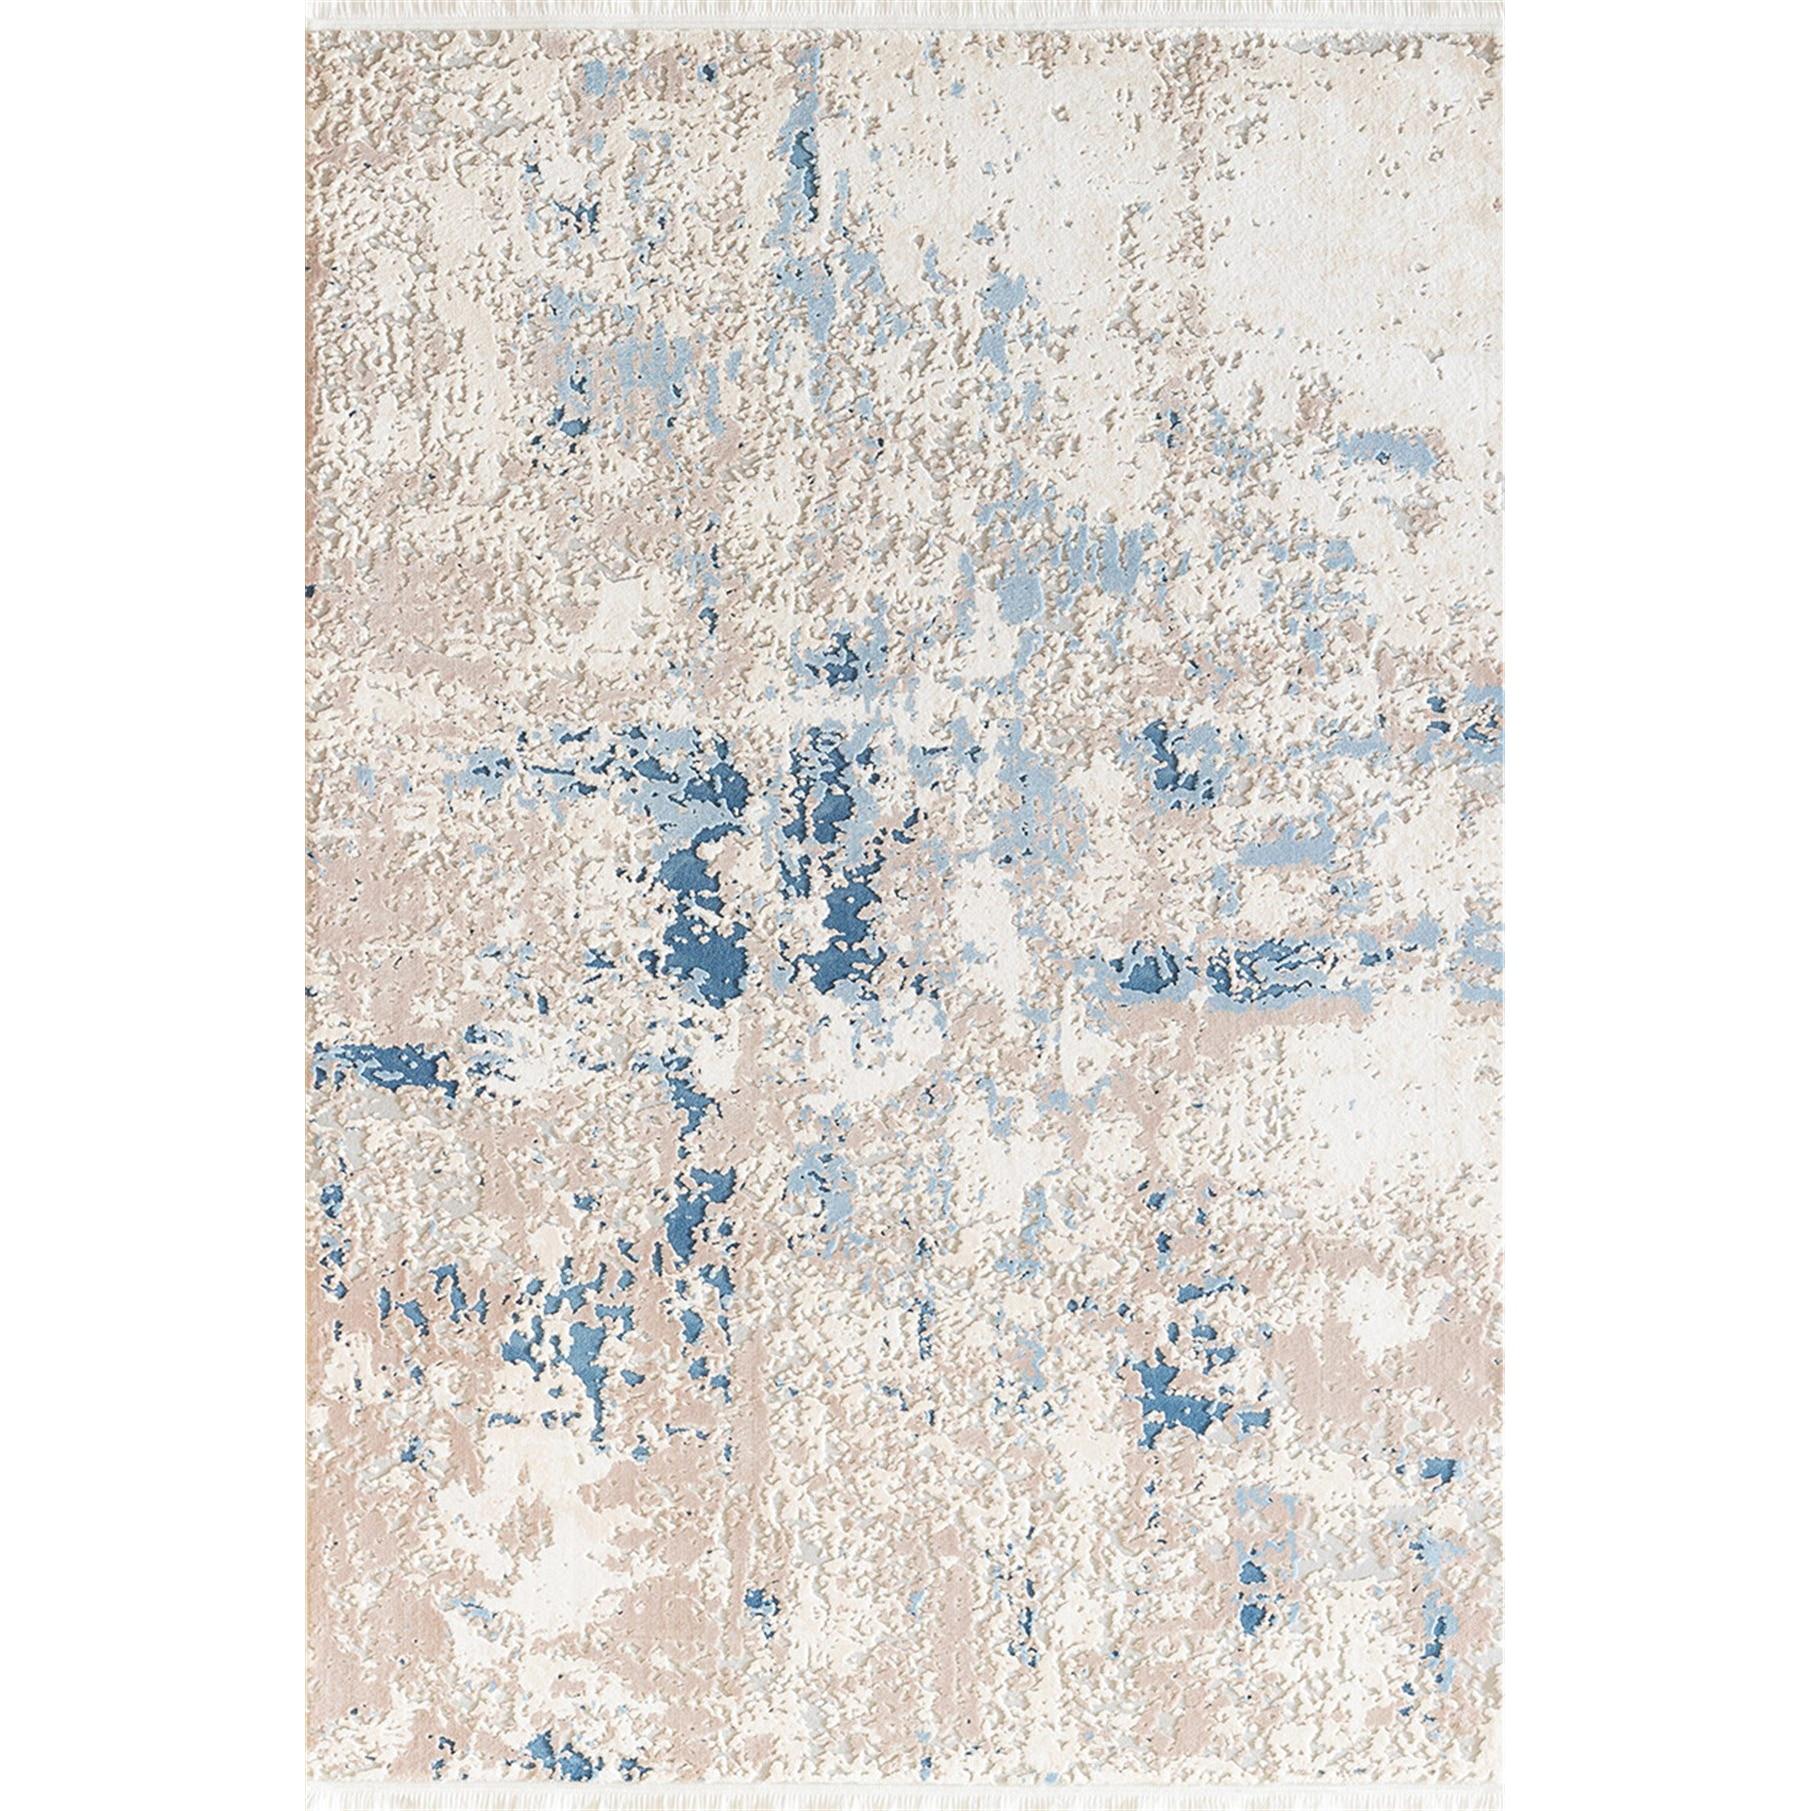 Fotografie Covor Girit Pierre Cardin, antistatic, acrilic, 160x230cm, albastru/crem, GR12B